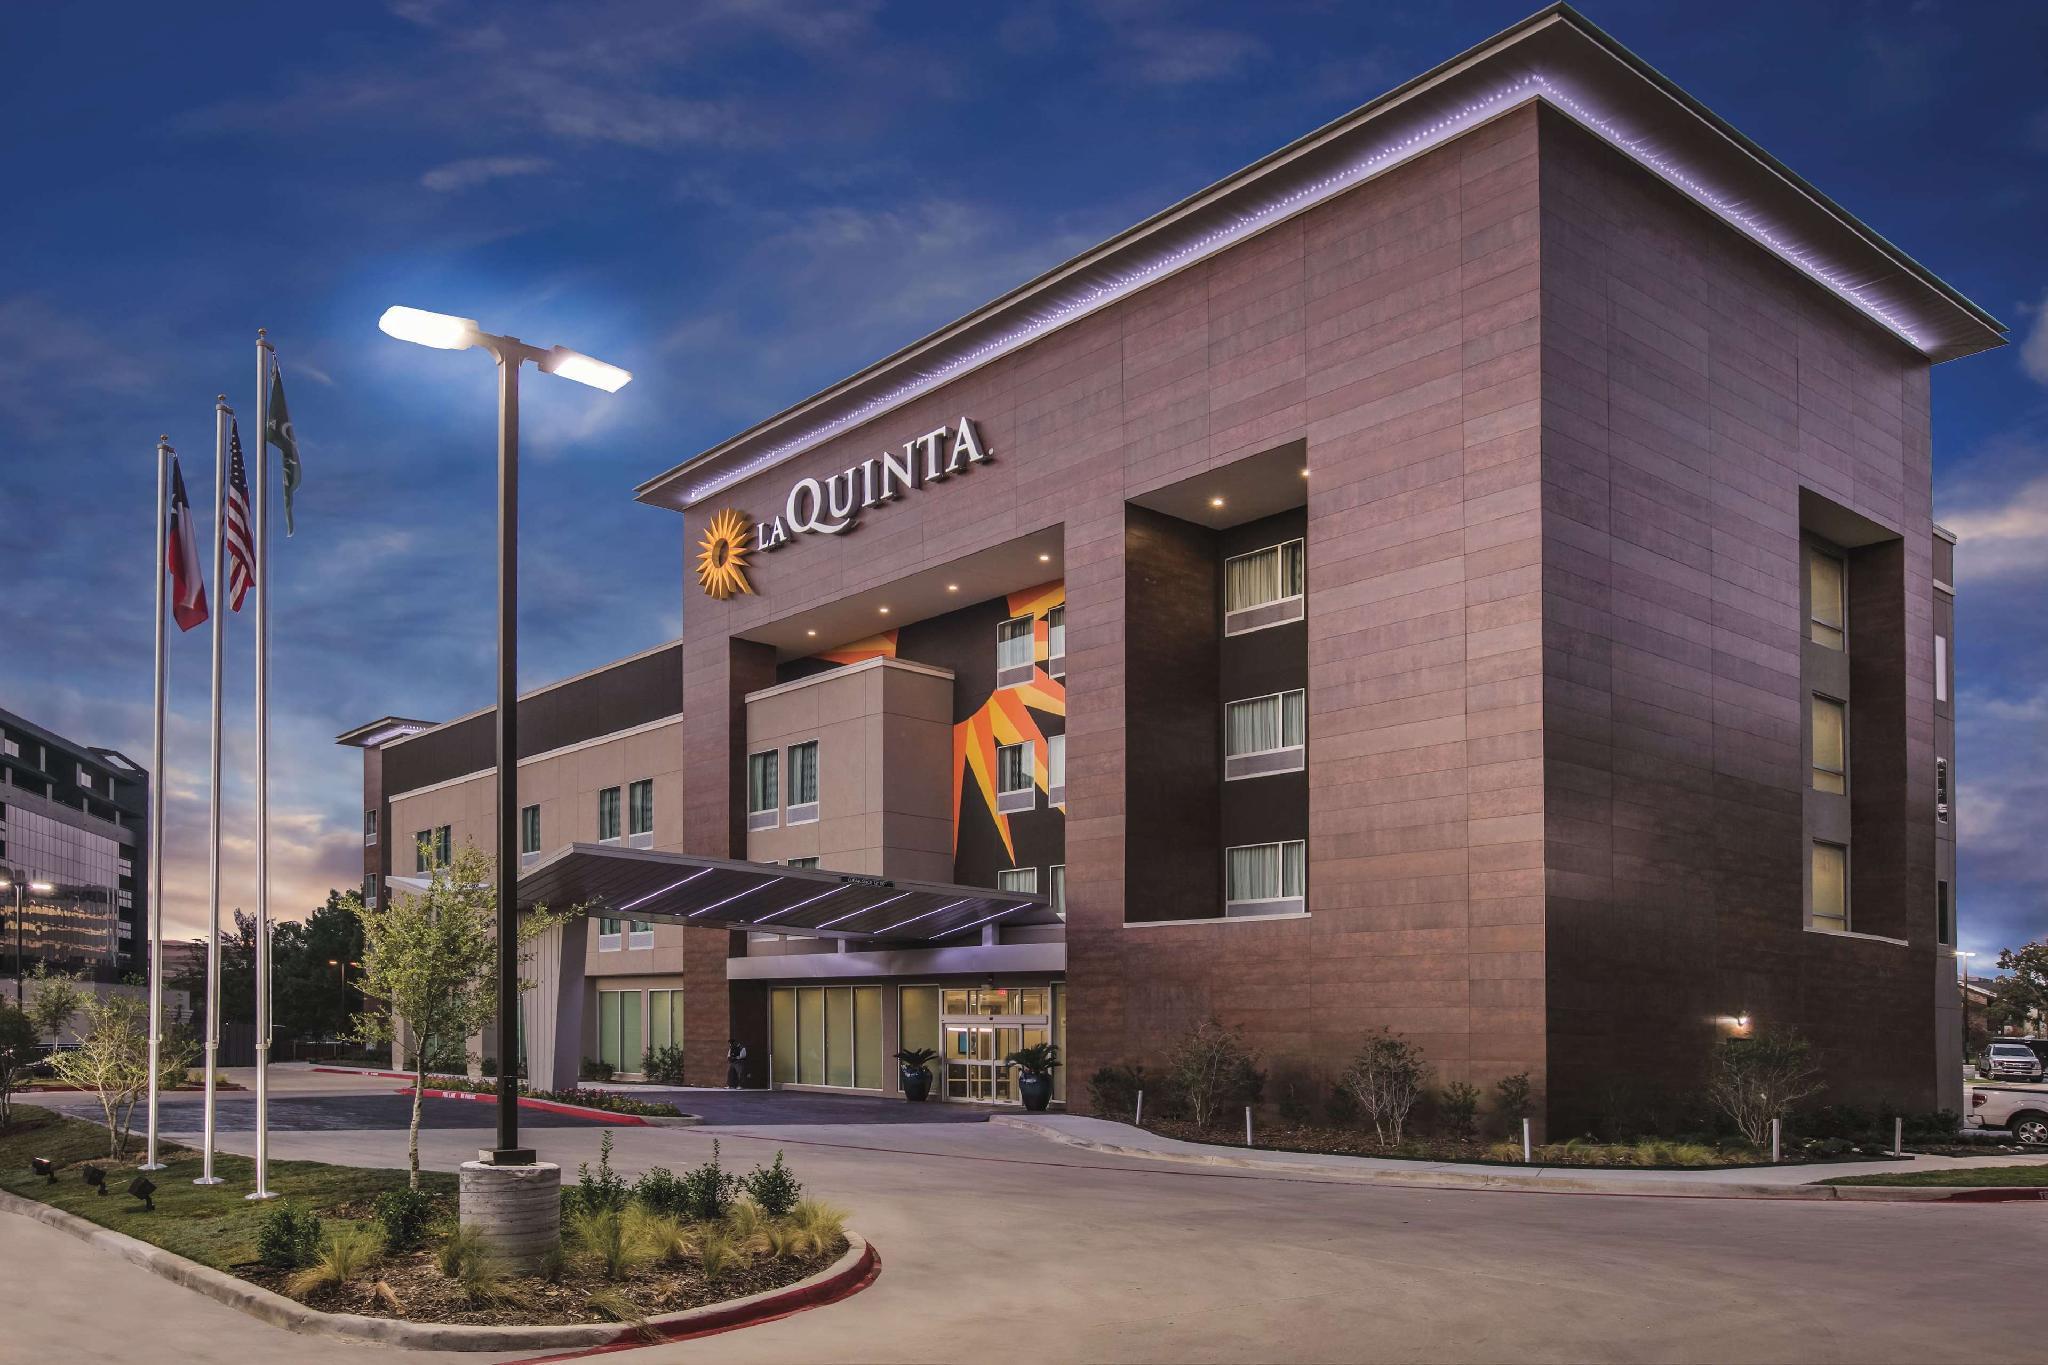 La Quinta Inn And Suites By Wyndham Dallas   Richardson